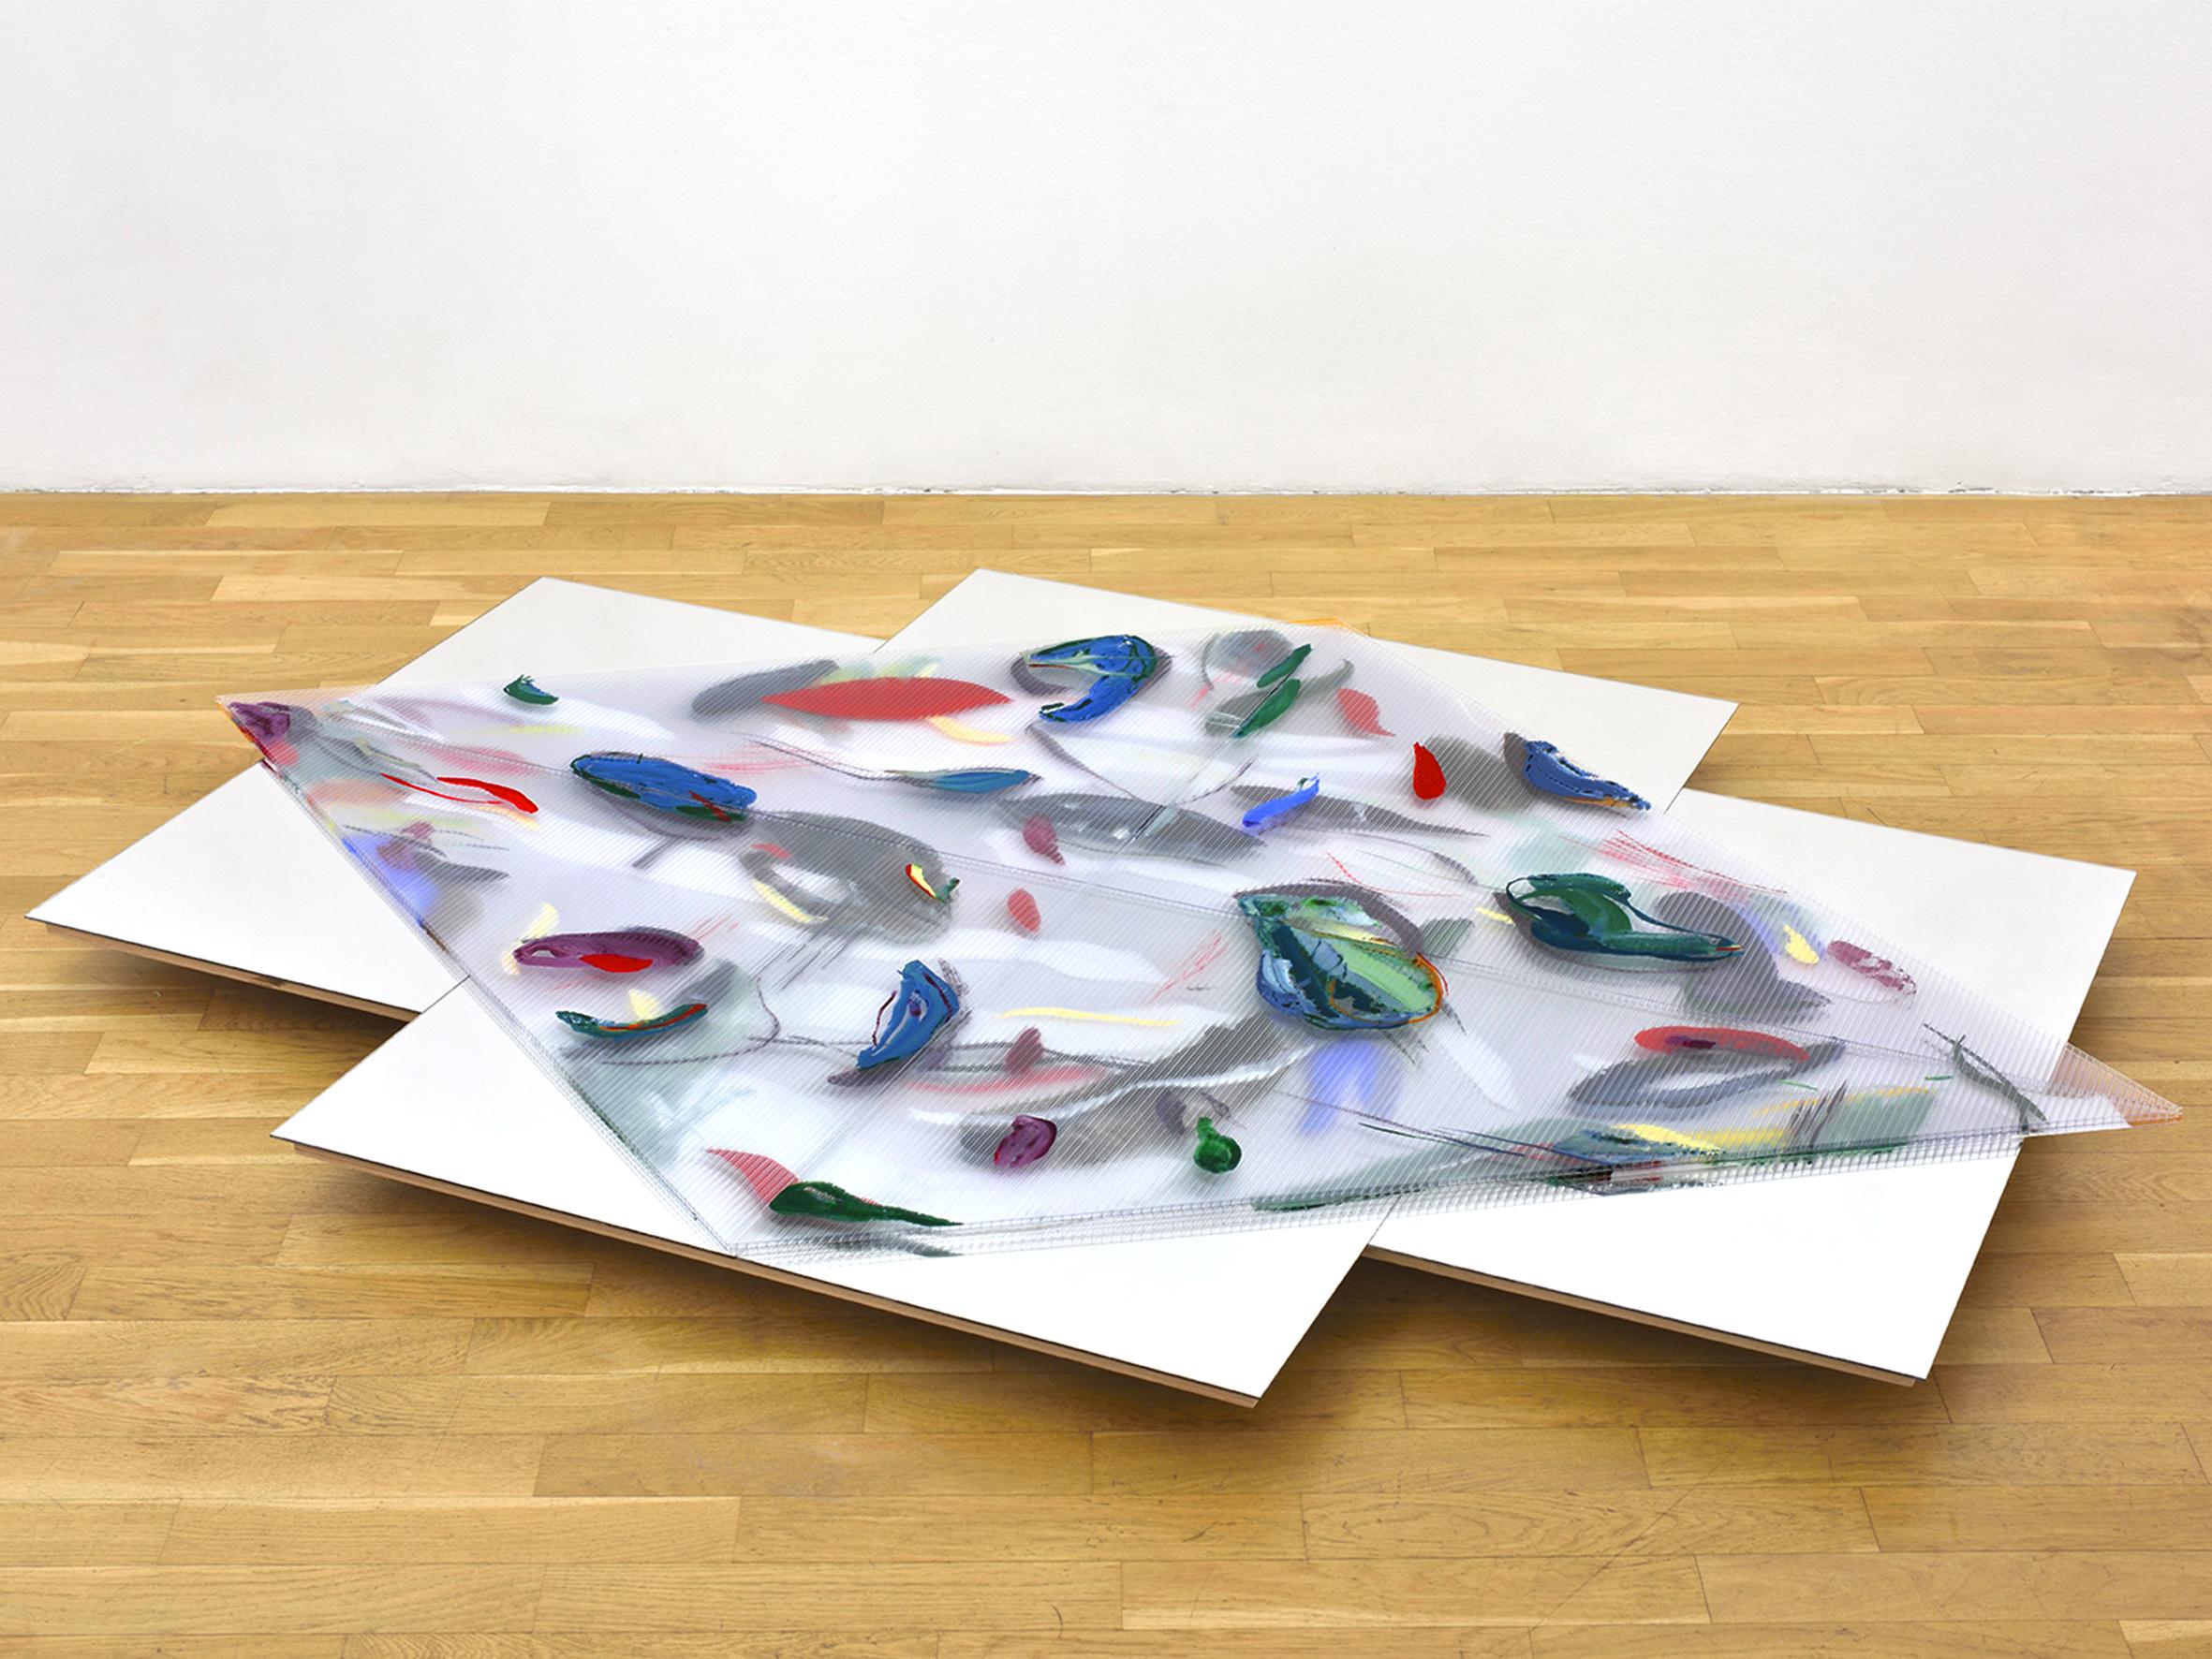 Untitled (Riverbed) , 2019 gouache, ink, gesso on polycarbonate, acrylic mirror, wood, wheels 183 x 119,5 x 9 cm  © Rebecca Fanuele